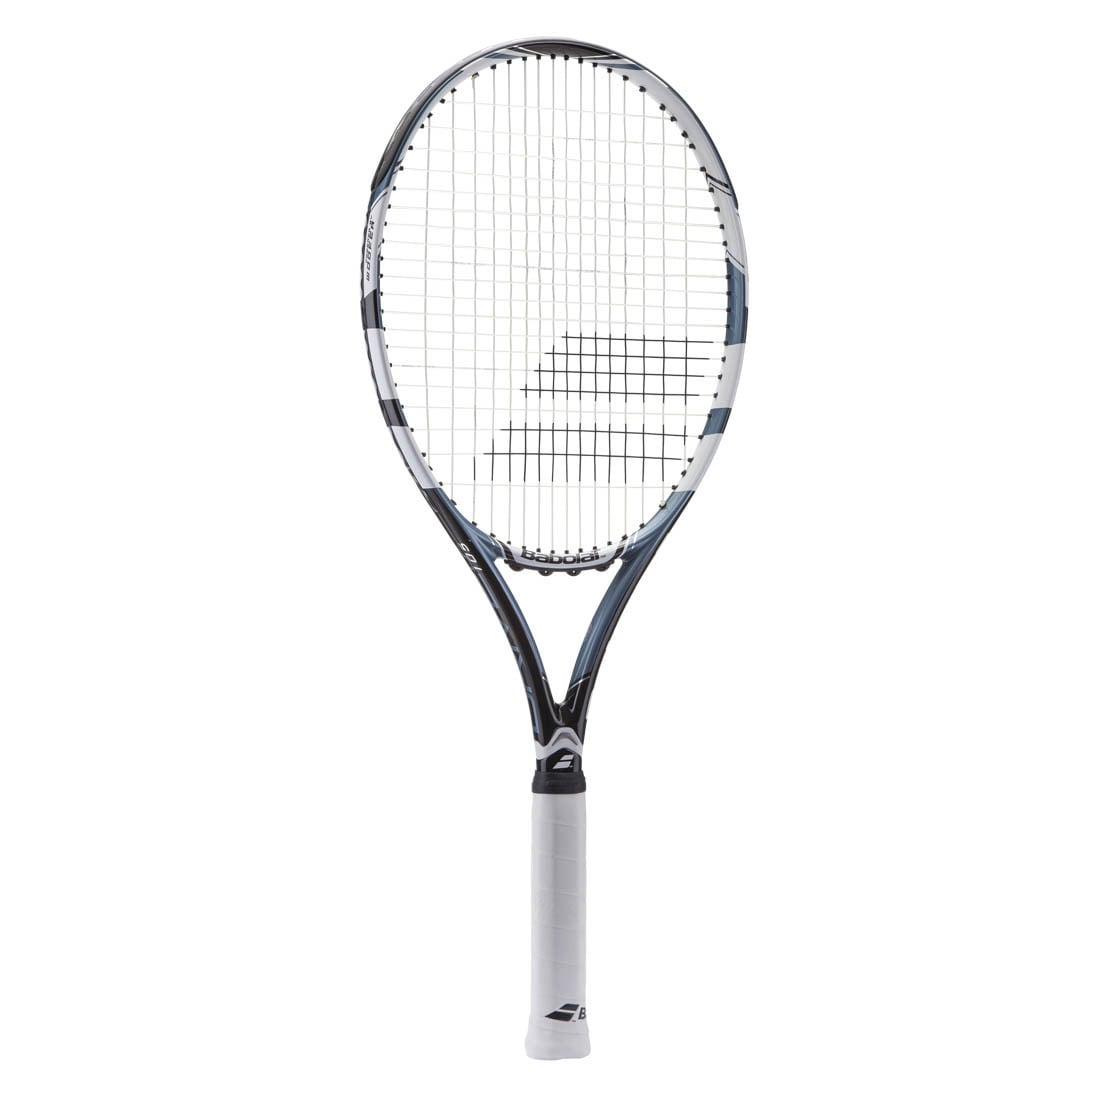 Babolat Drive 105 Tennis Racquet (Black - 4-3/8'), Size 4...